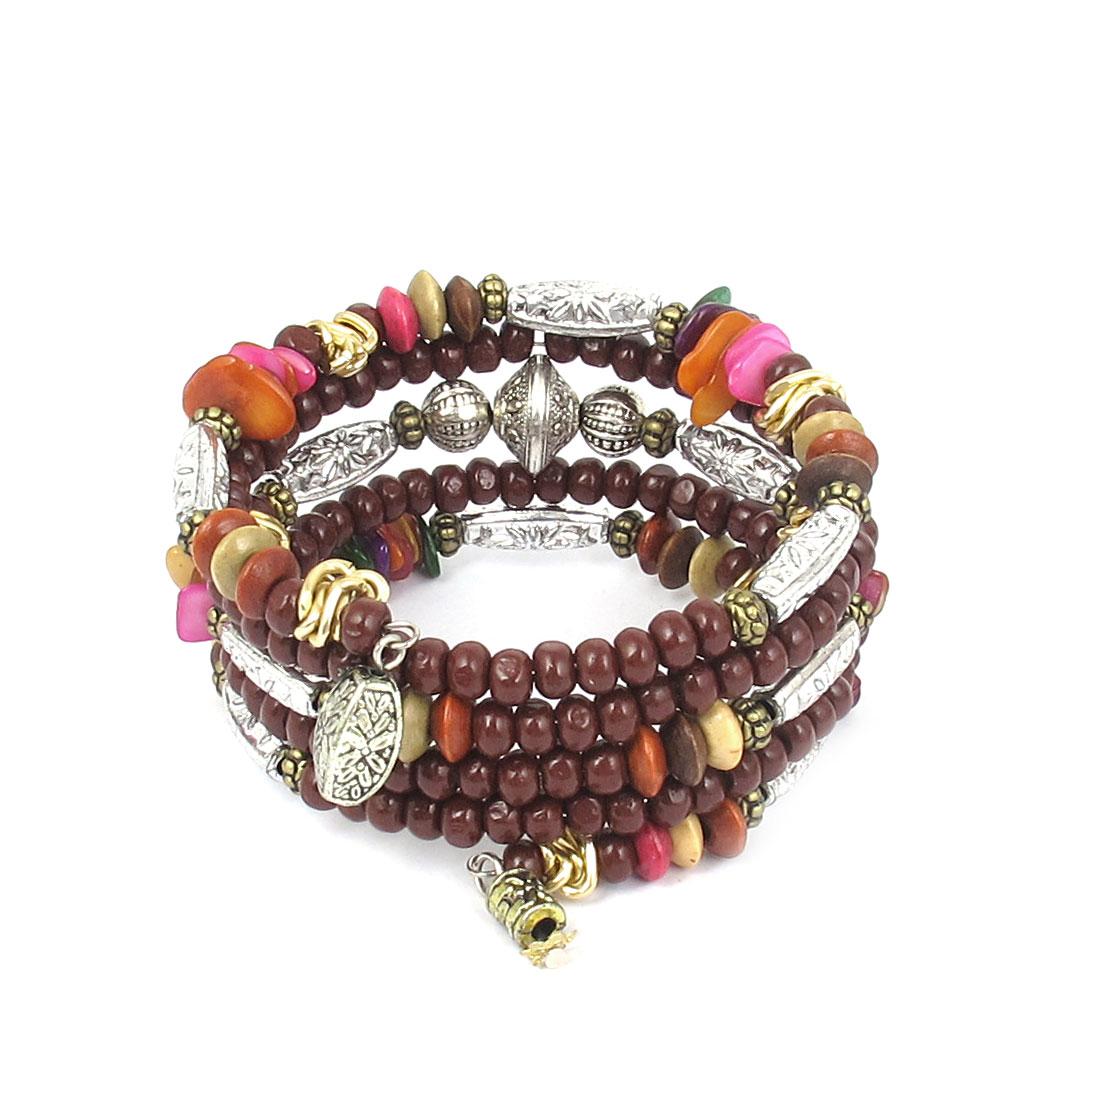 Lady National Style Handmade Wooden Beads Multi-layer Wrist Bangle Bracelet Bergundy Silver Tone